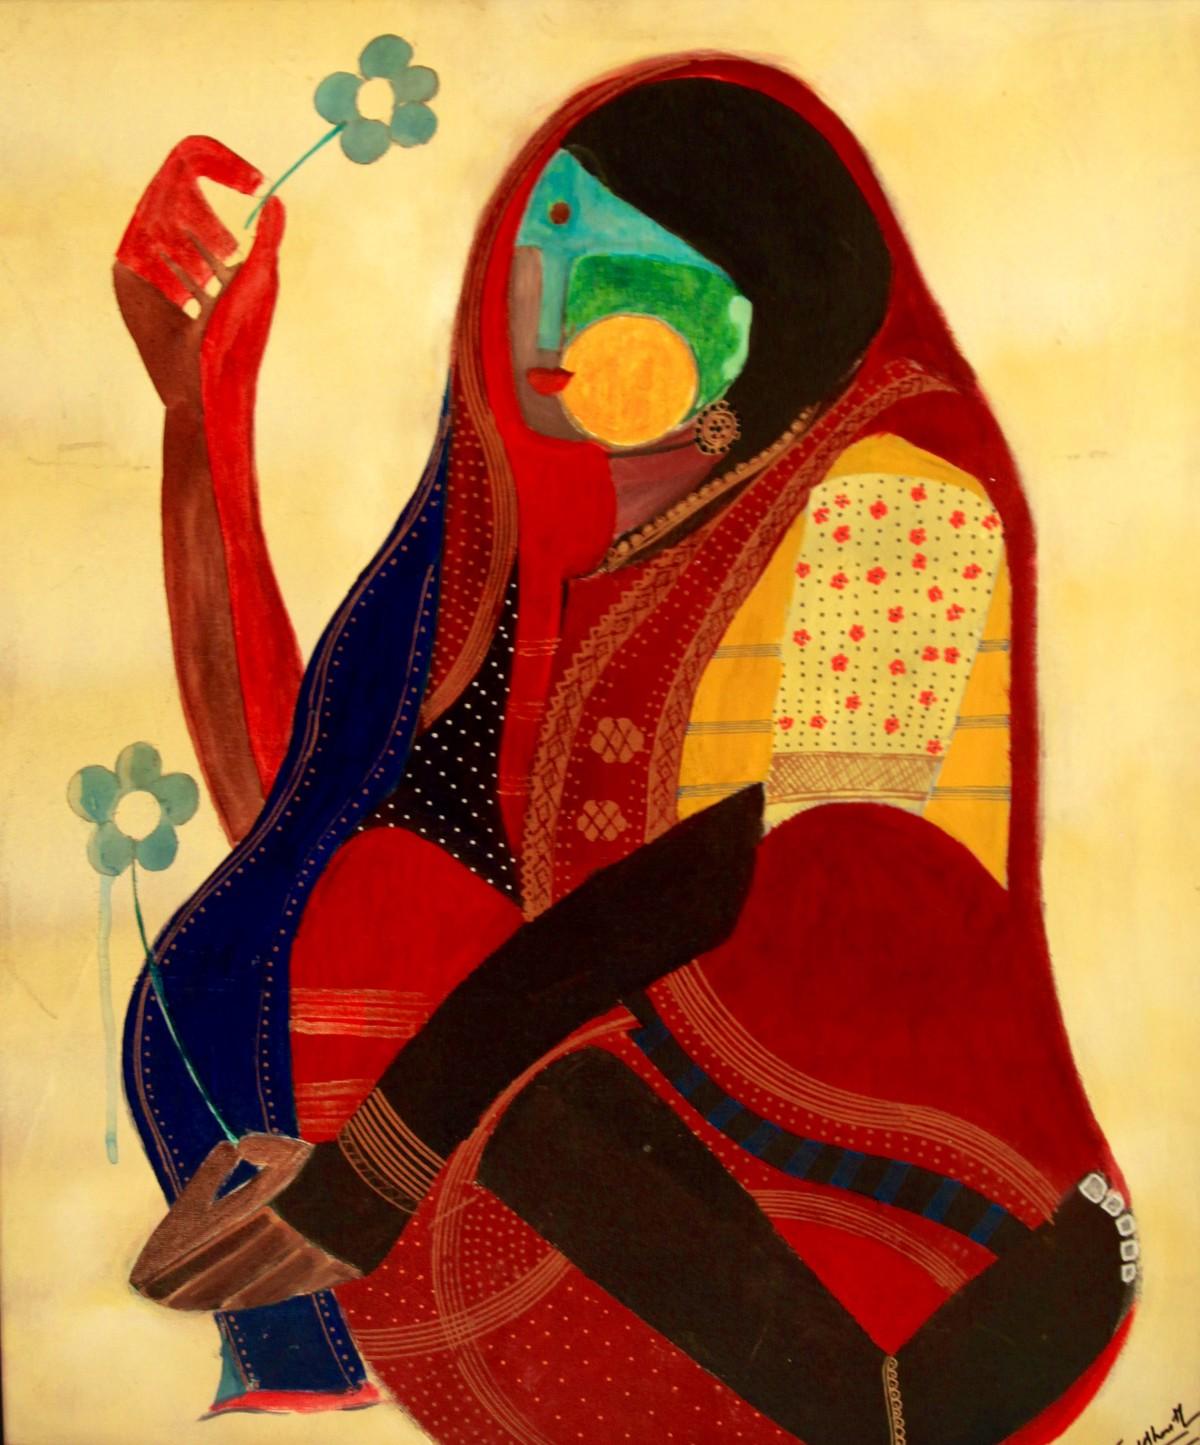 Blue Flower Series by Siddharth Katragadda, Painting, Acrylic on Board, Beige color